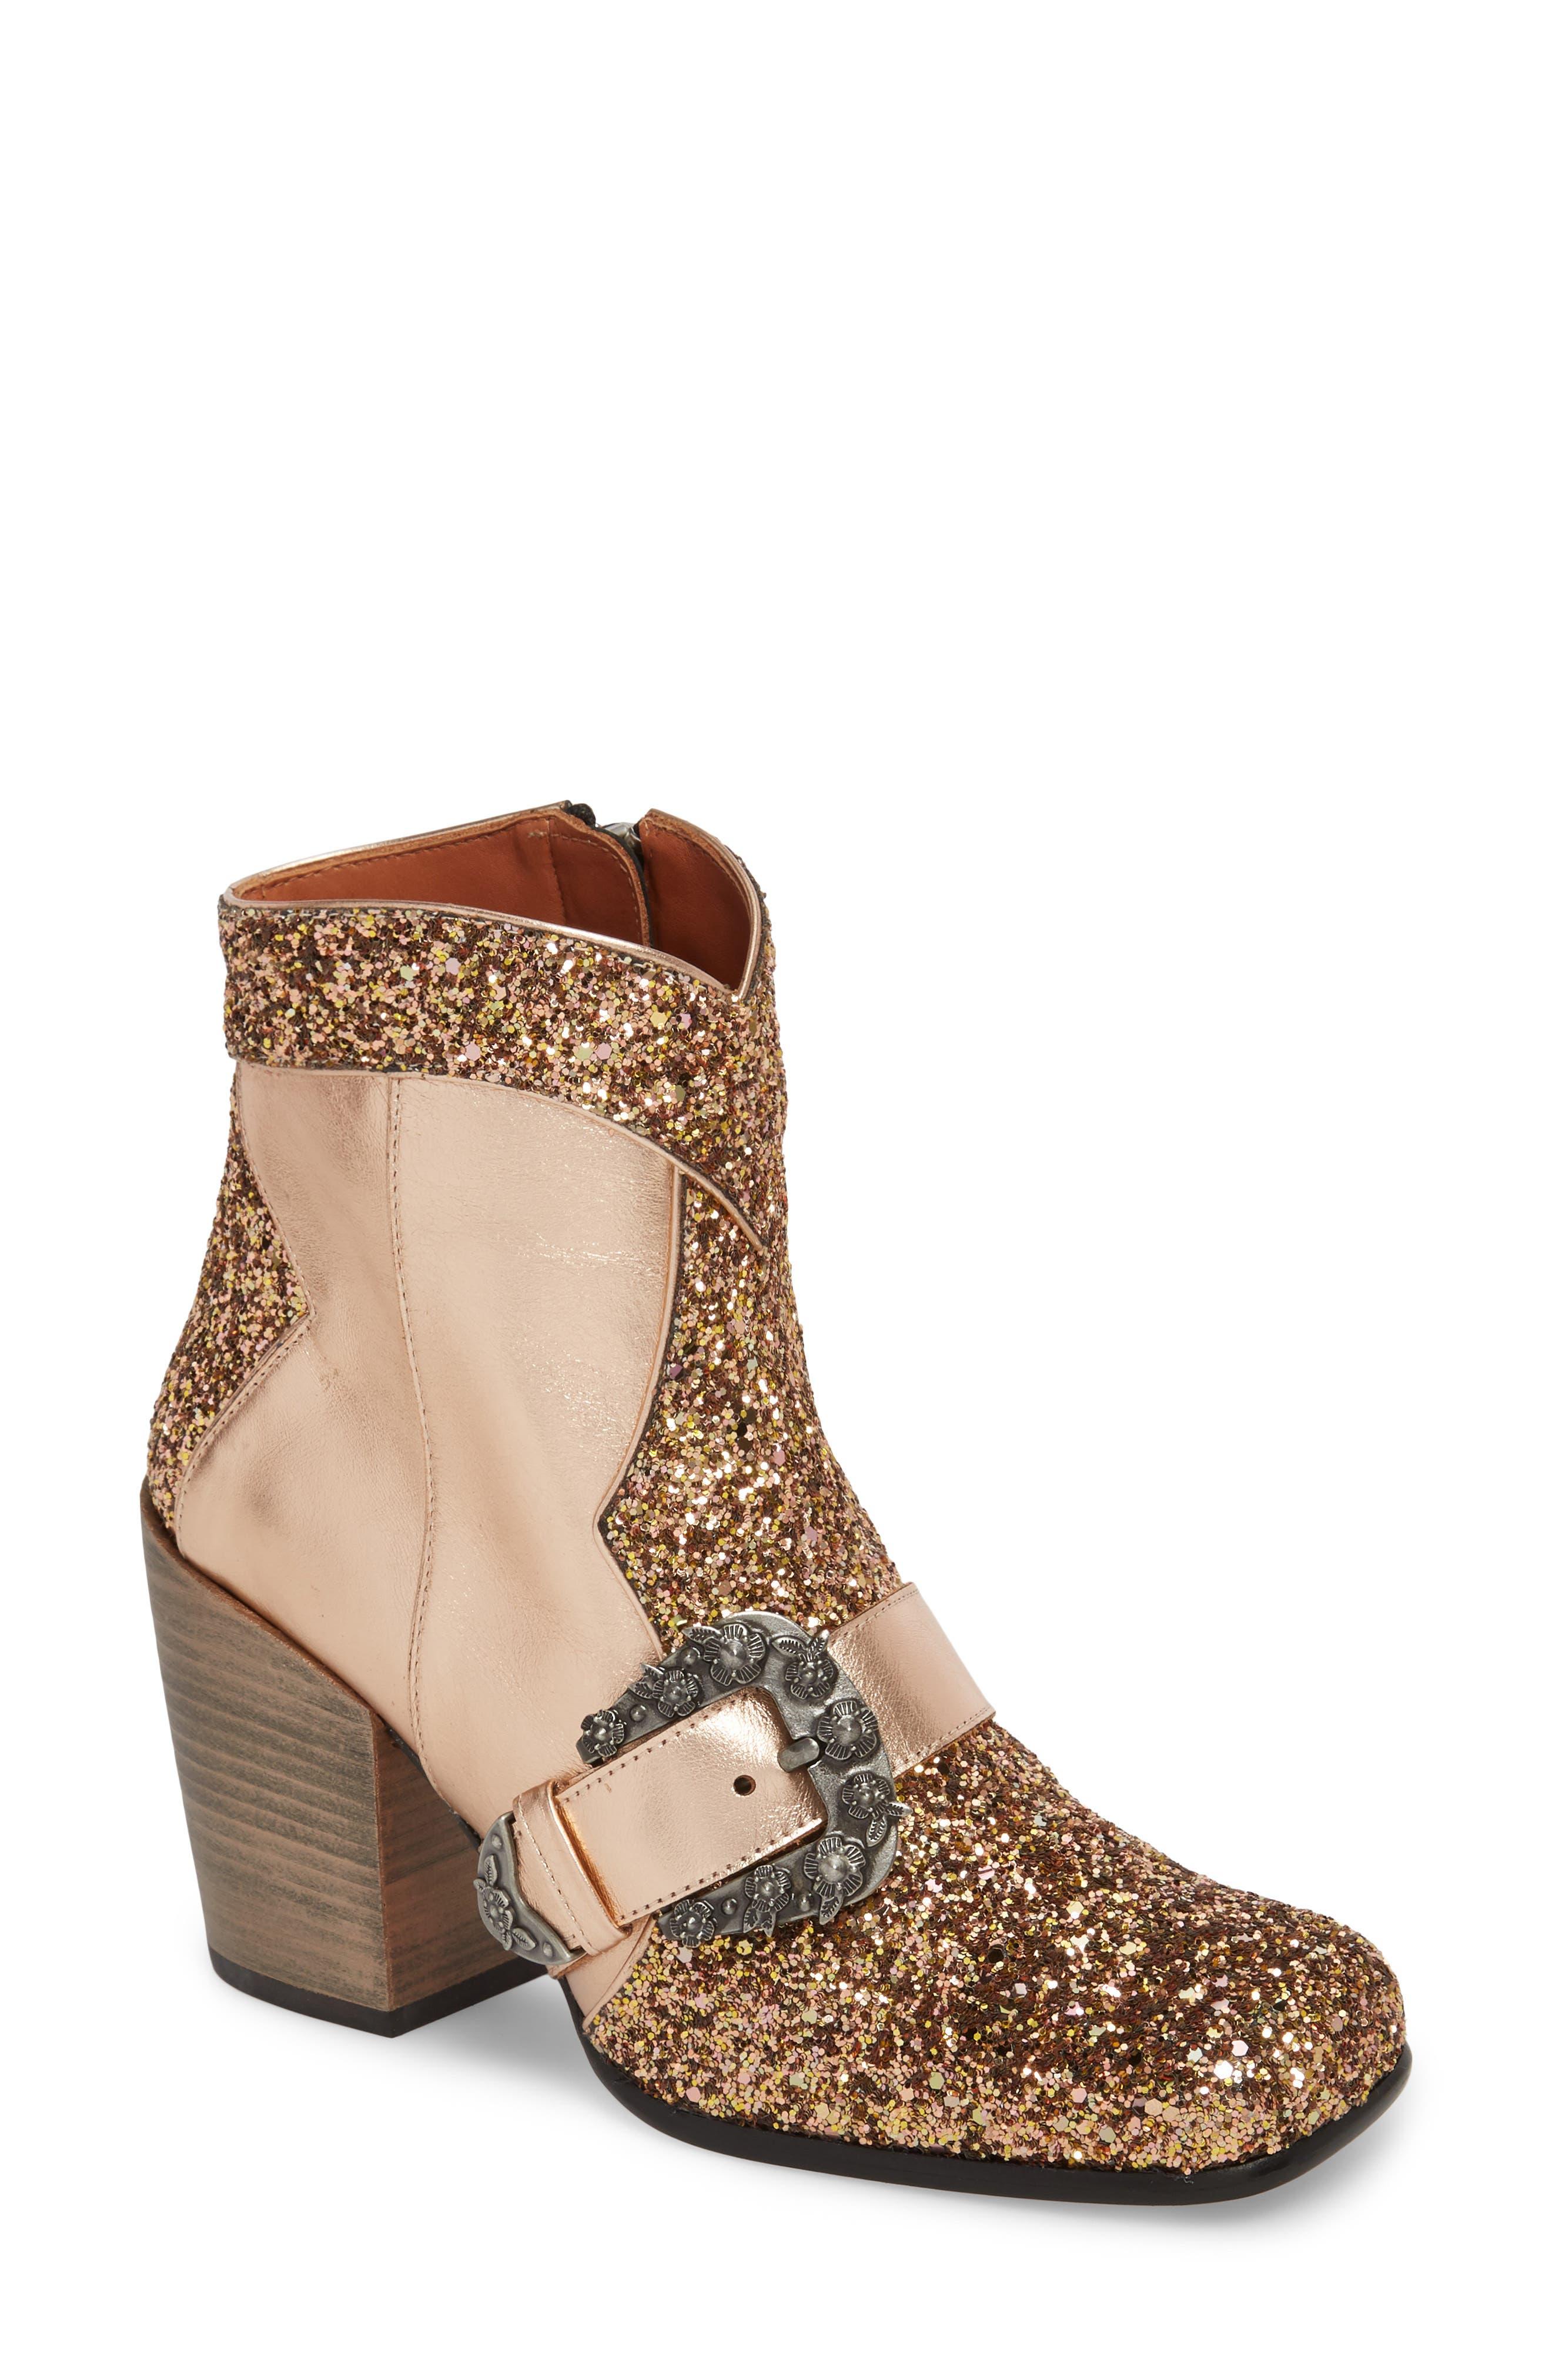 Women s COACH Boots Boots for Women